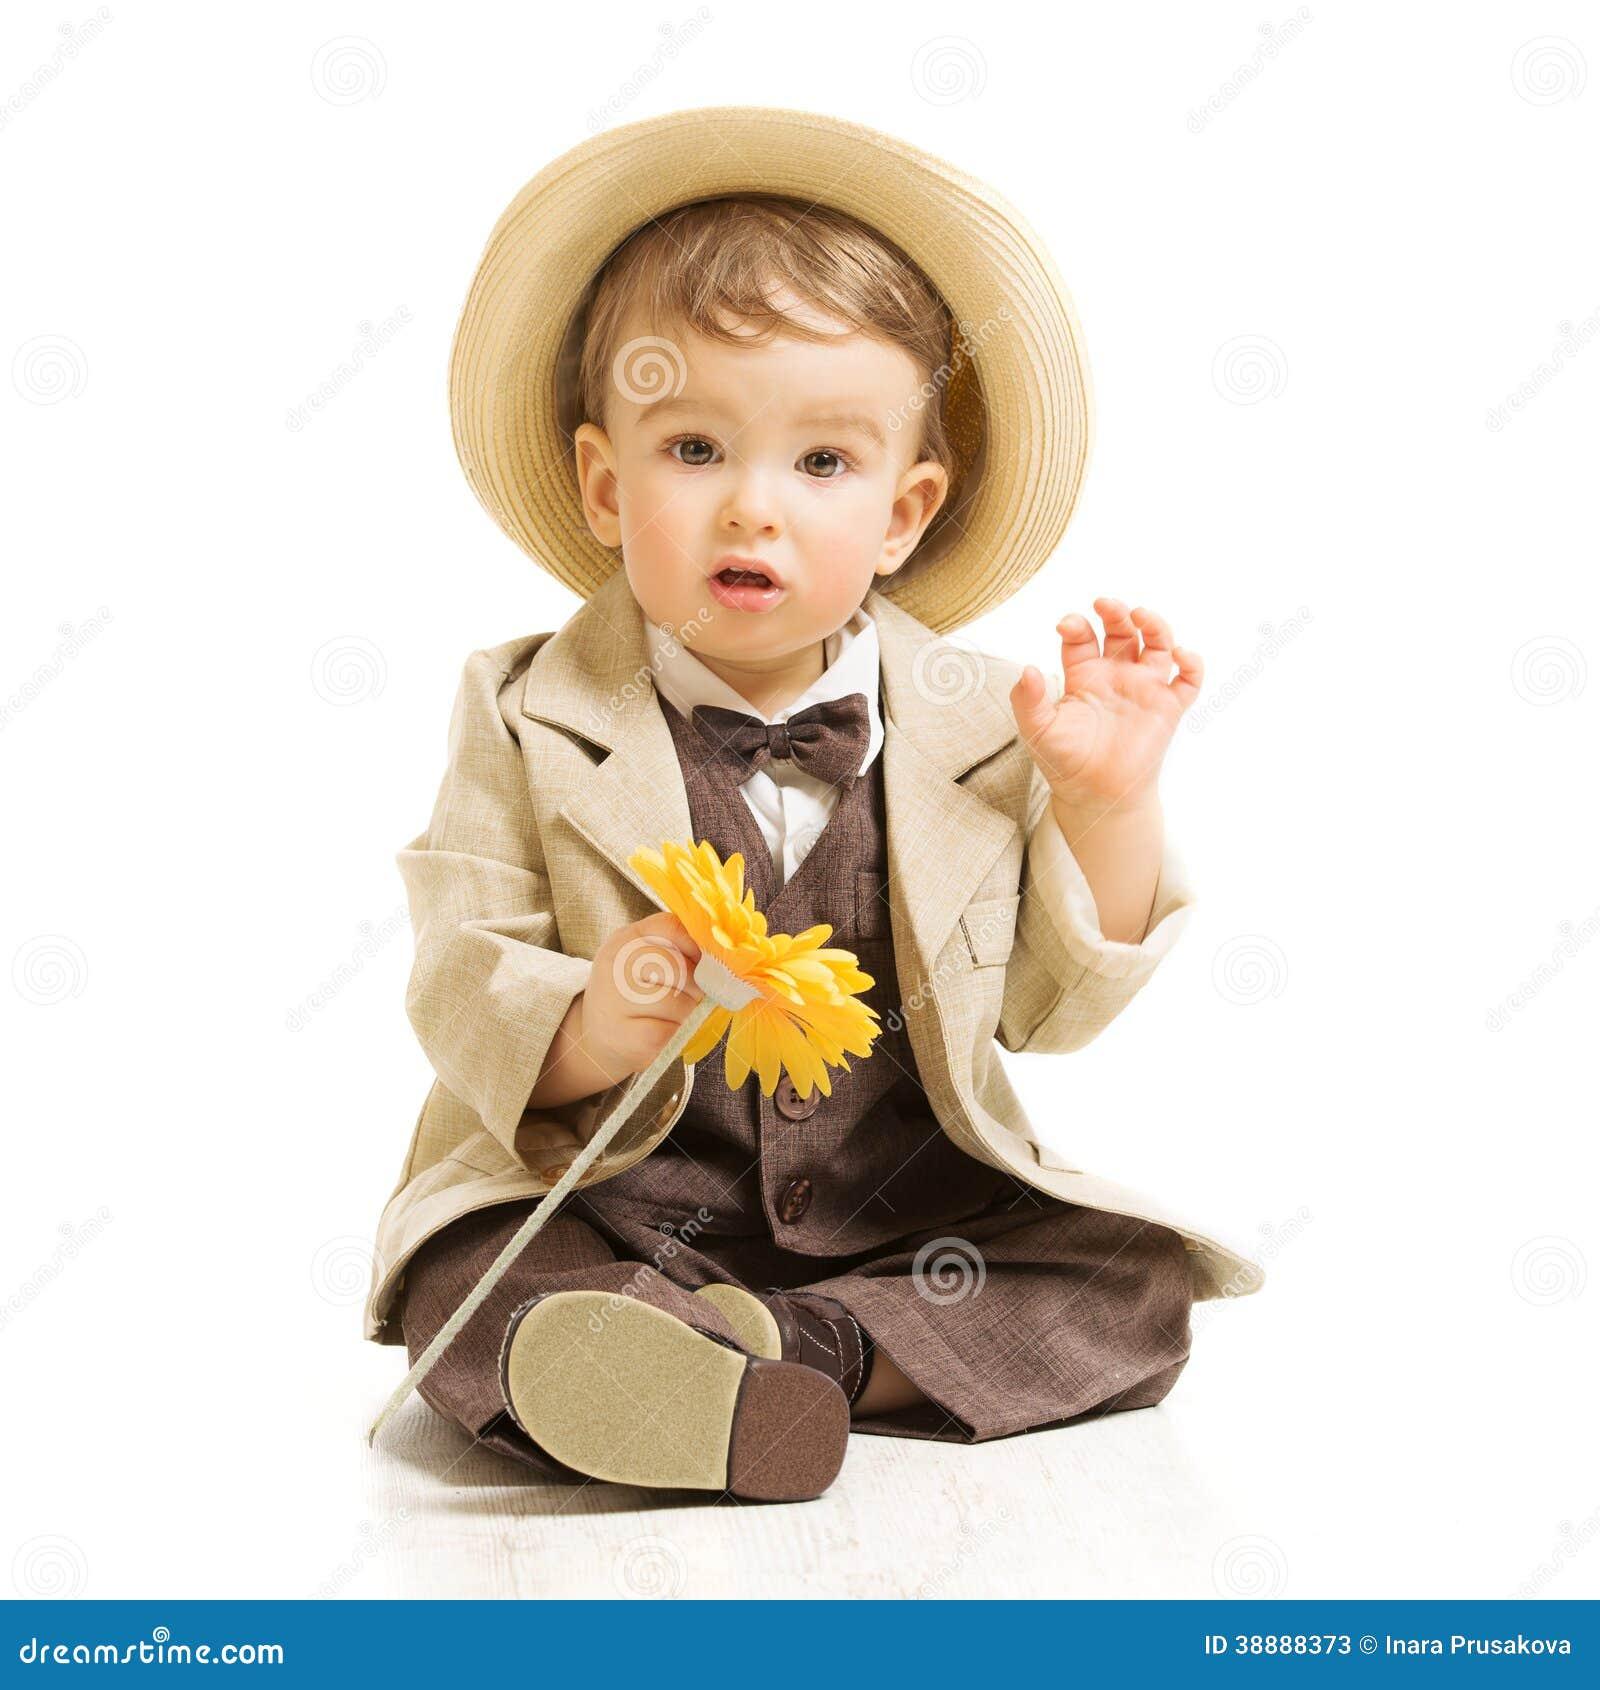 Baby boy in suit with flower. Vintage children